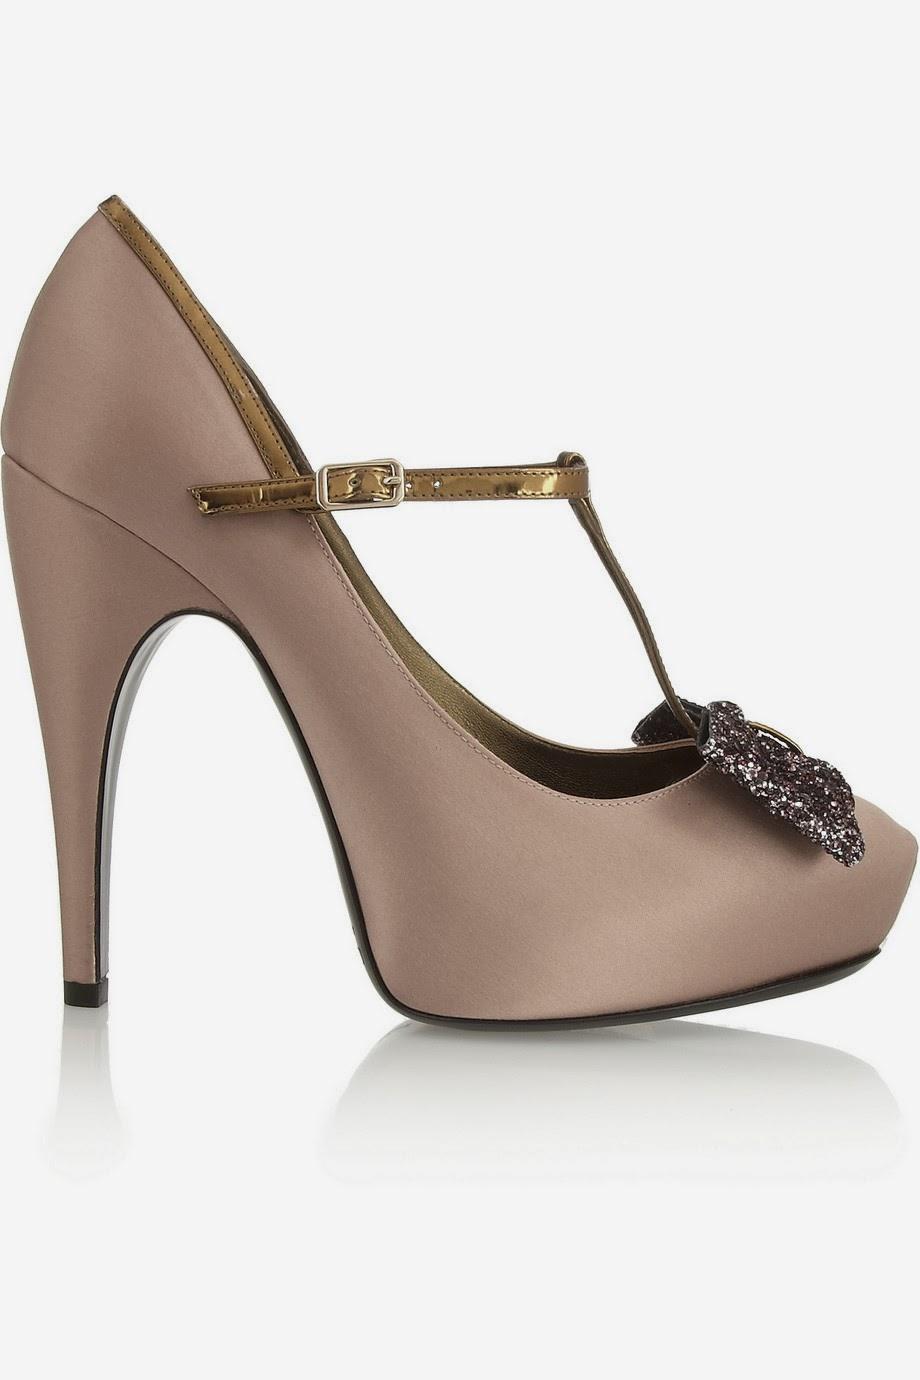 Permalink to Cinderella Wedding Shoes Dsw